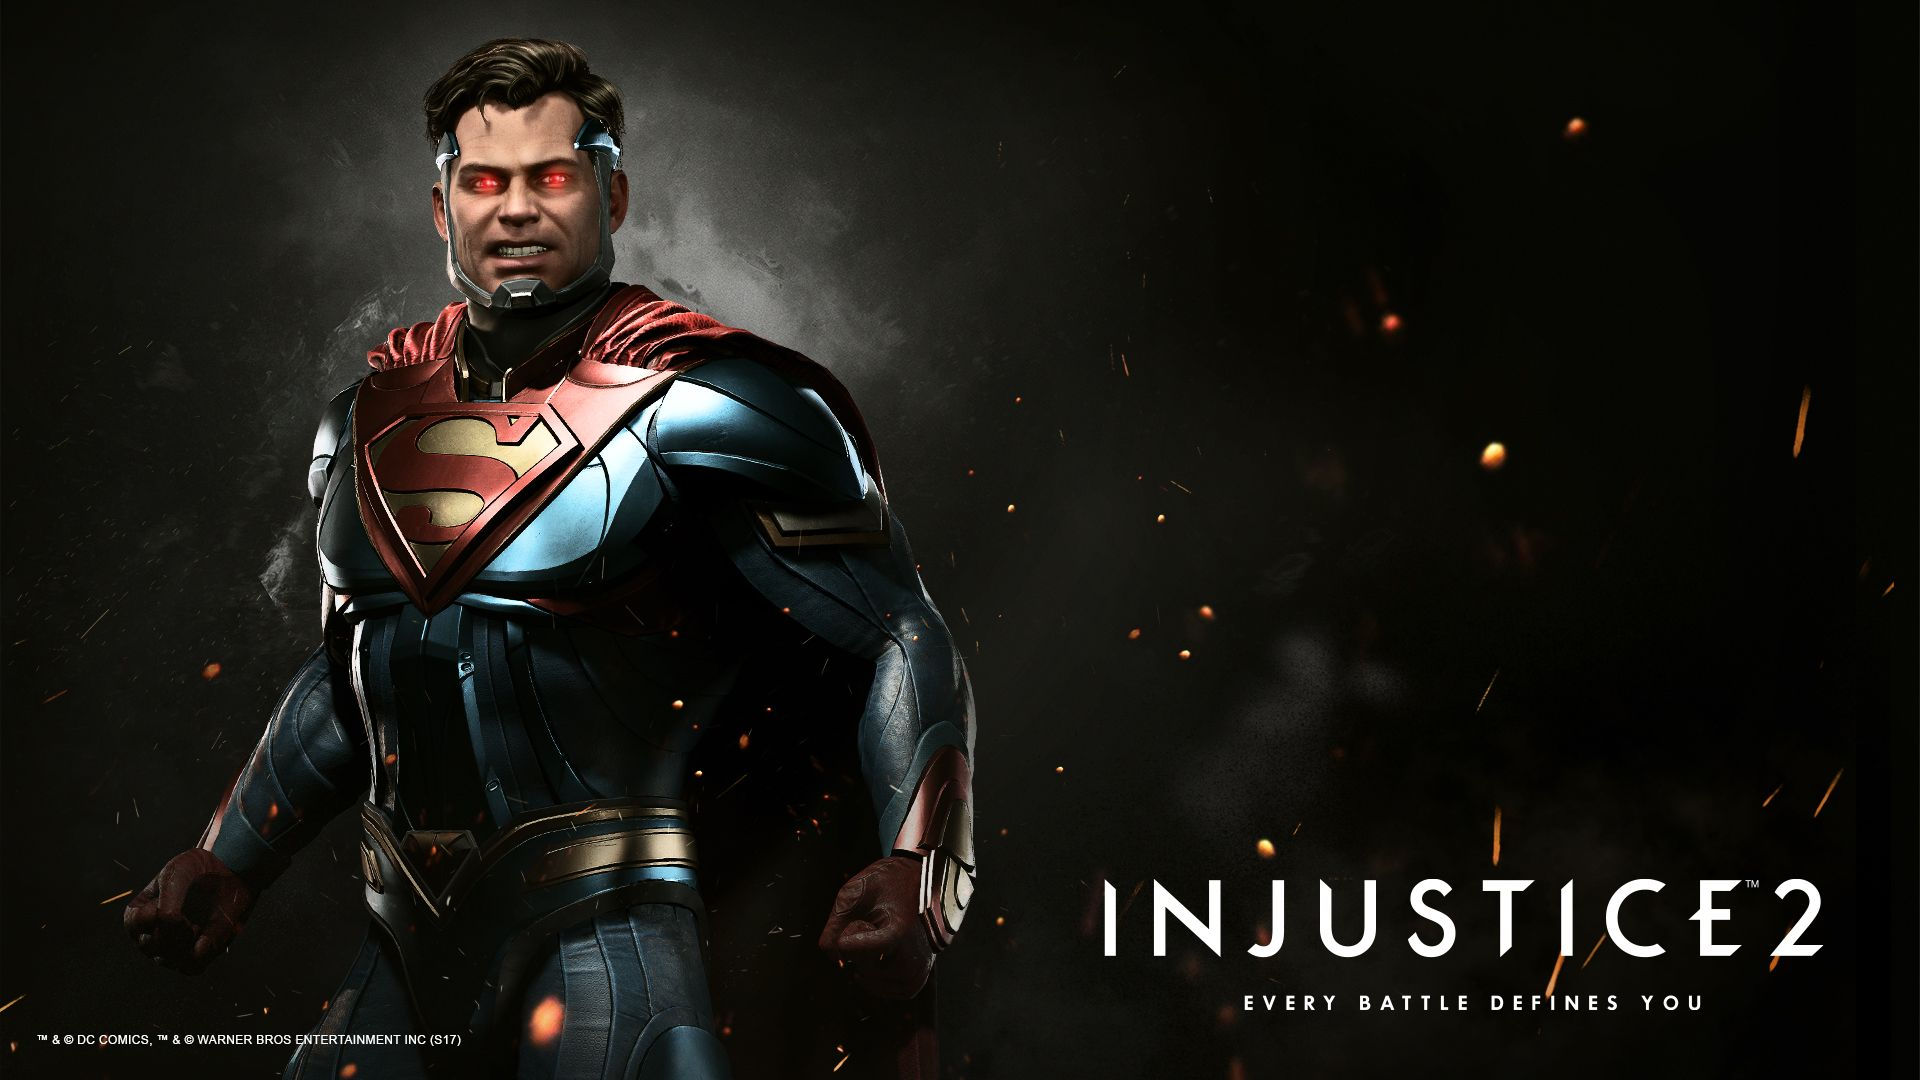 Image injustice2 superman wallpaper 1920x1080 42g injustice injustice2 superman wallpaper 1920x1080 42g voltagebd Choice Image